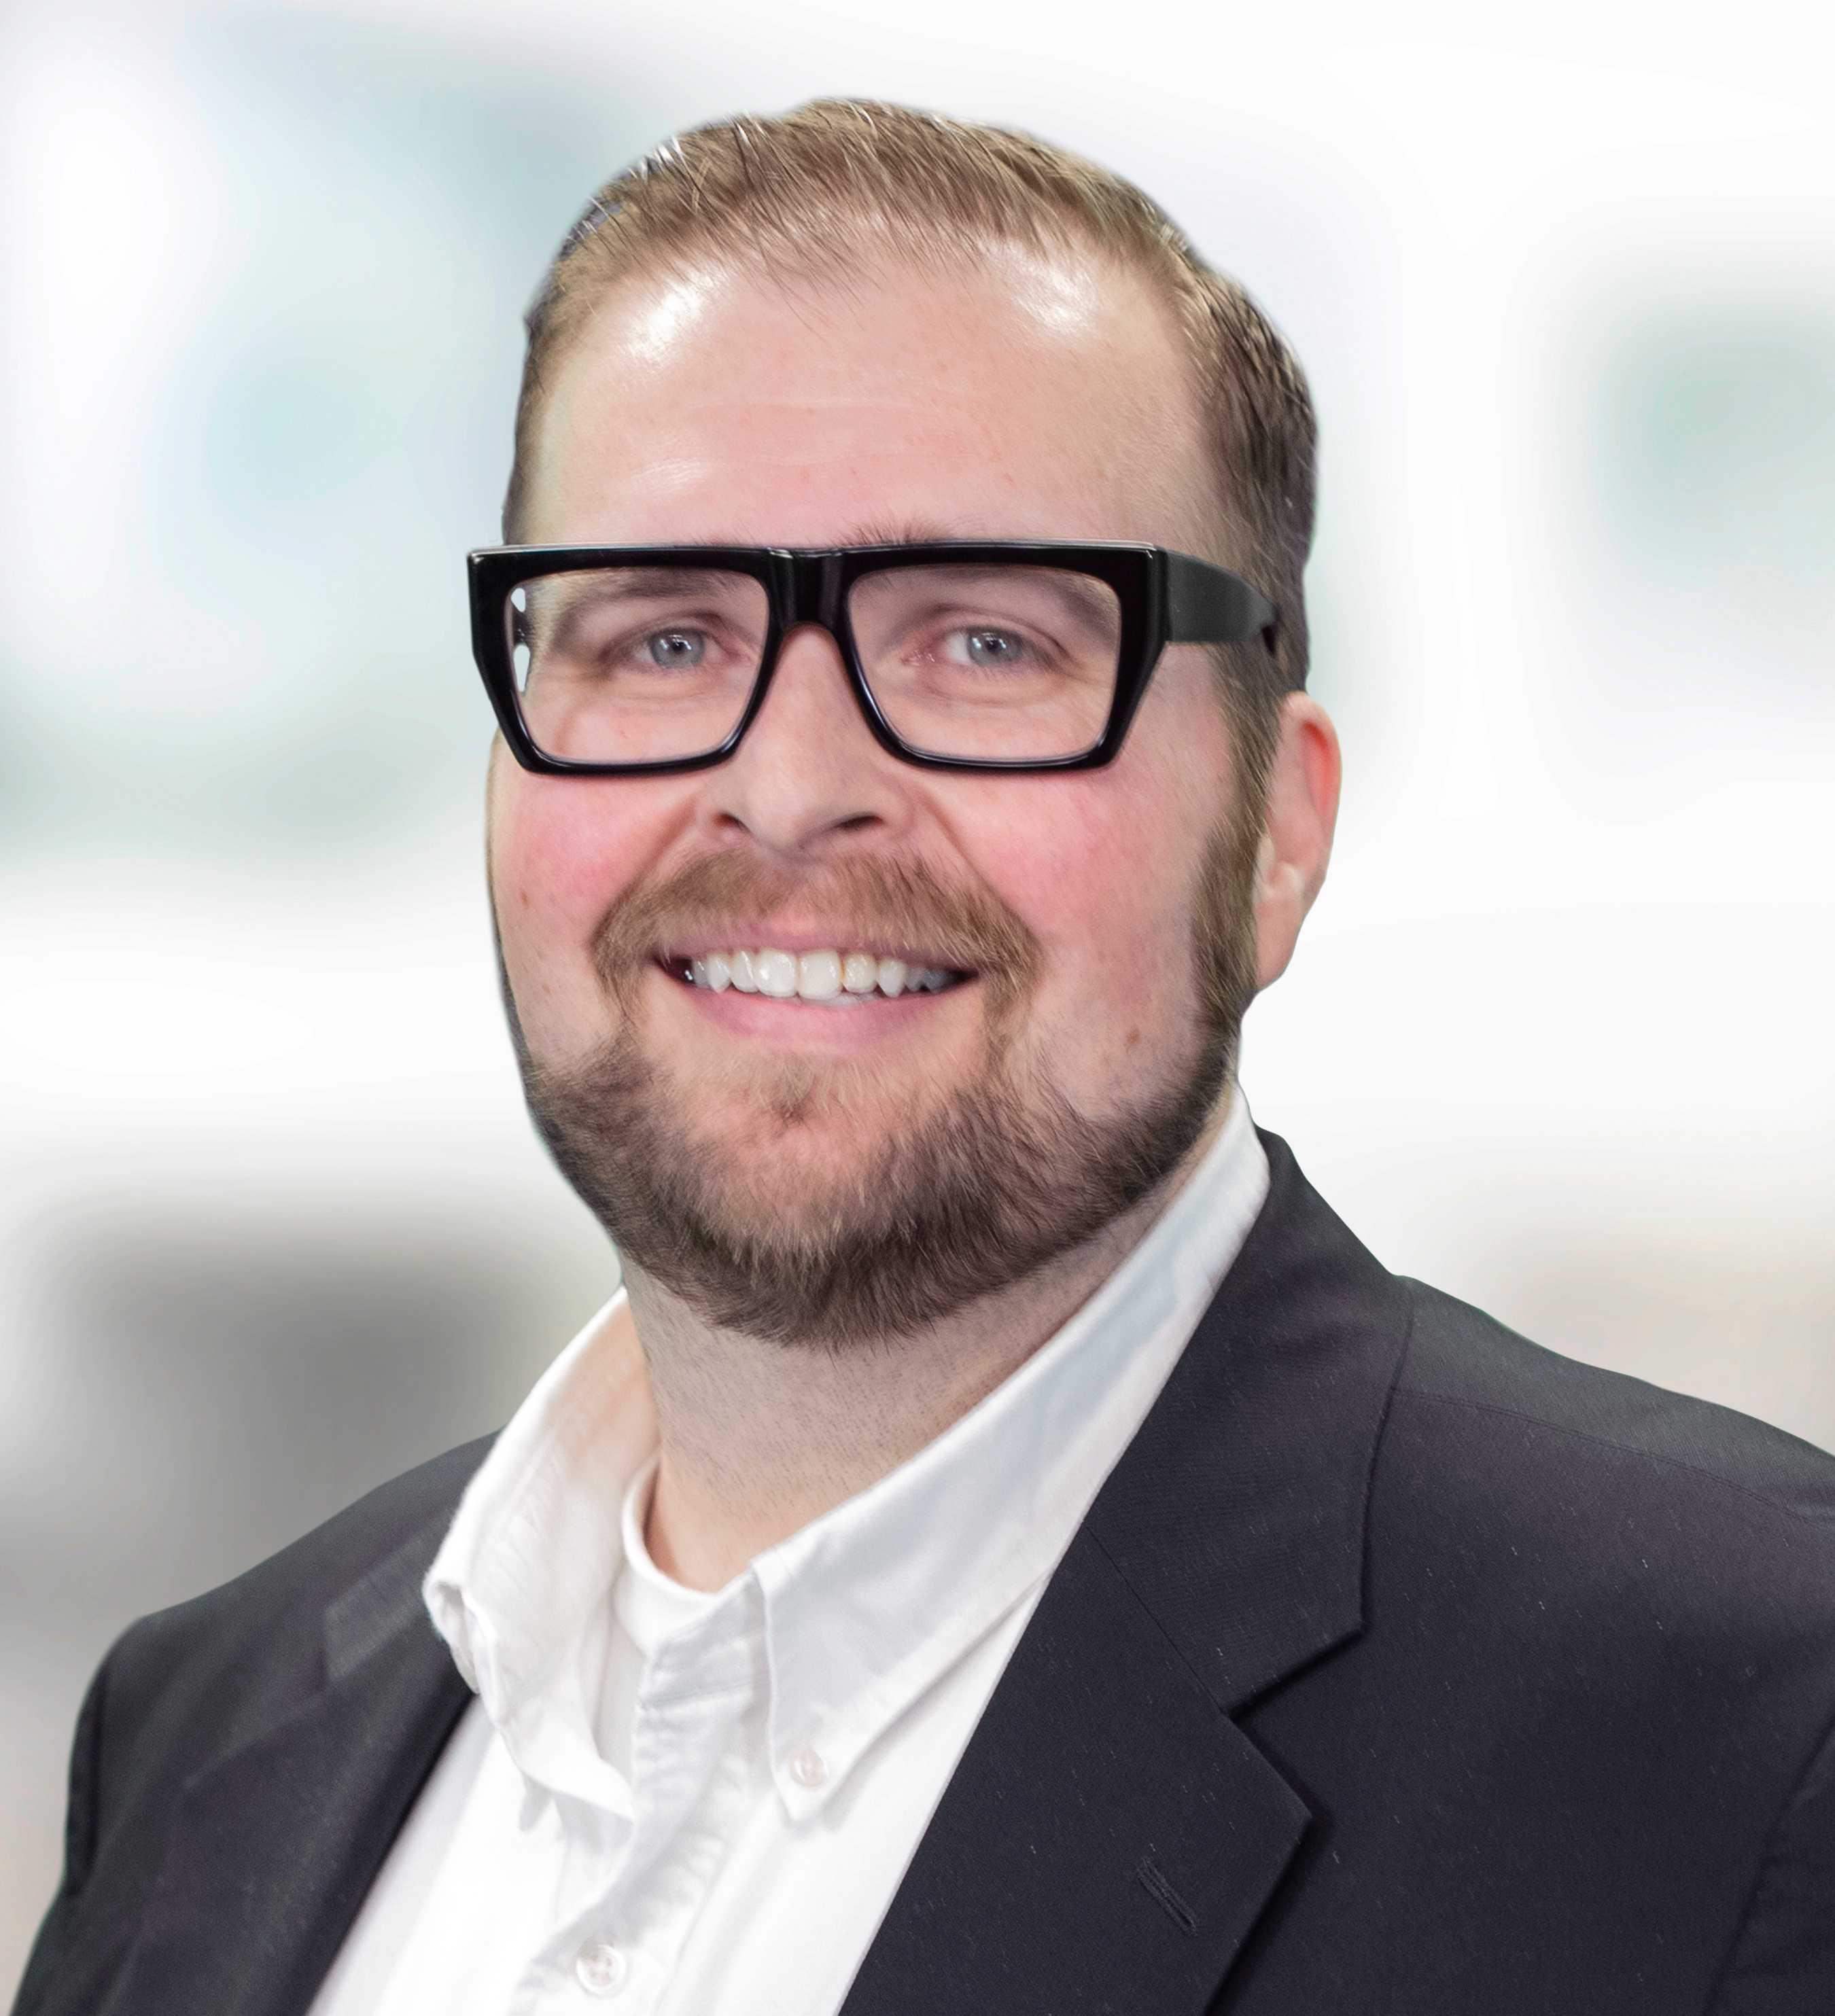 Accruent - Biography - Vice President - Human Resources - Aaron Hamilton